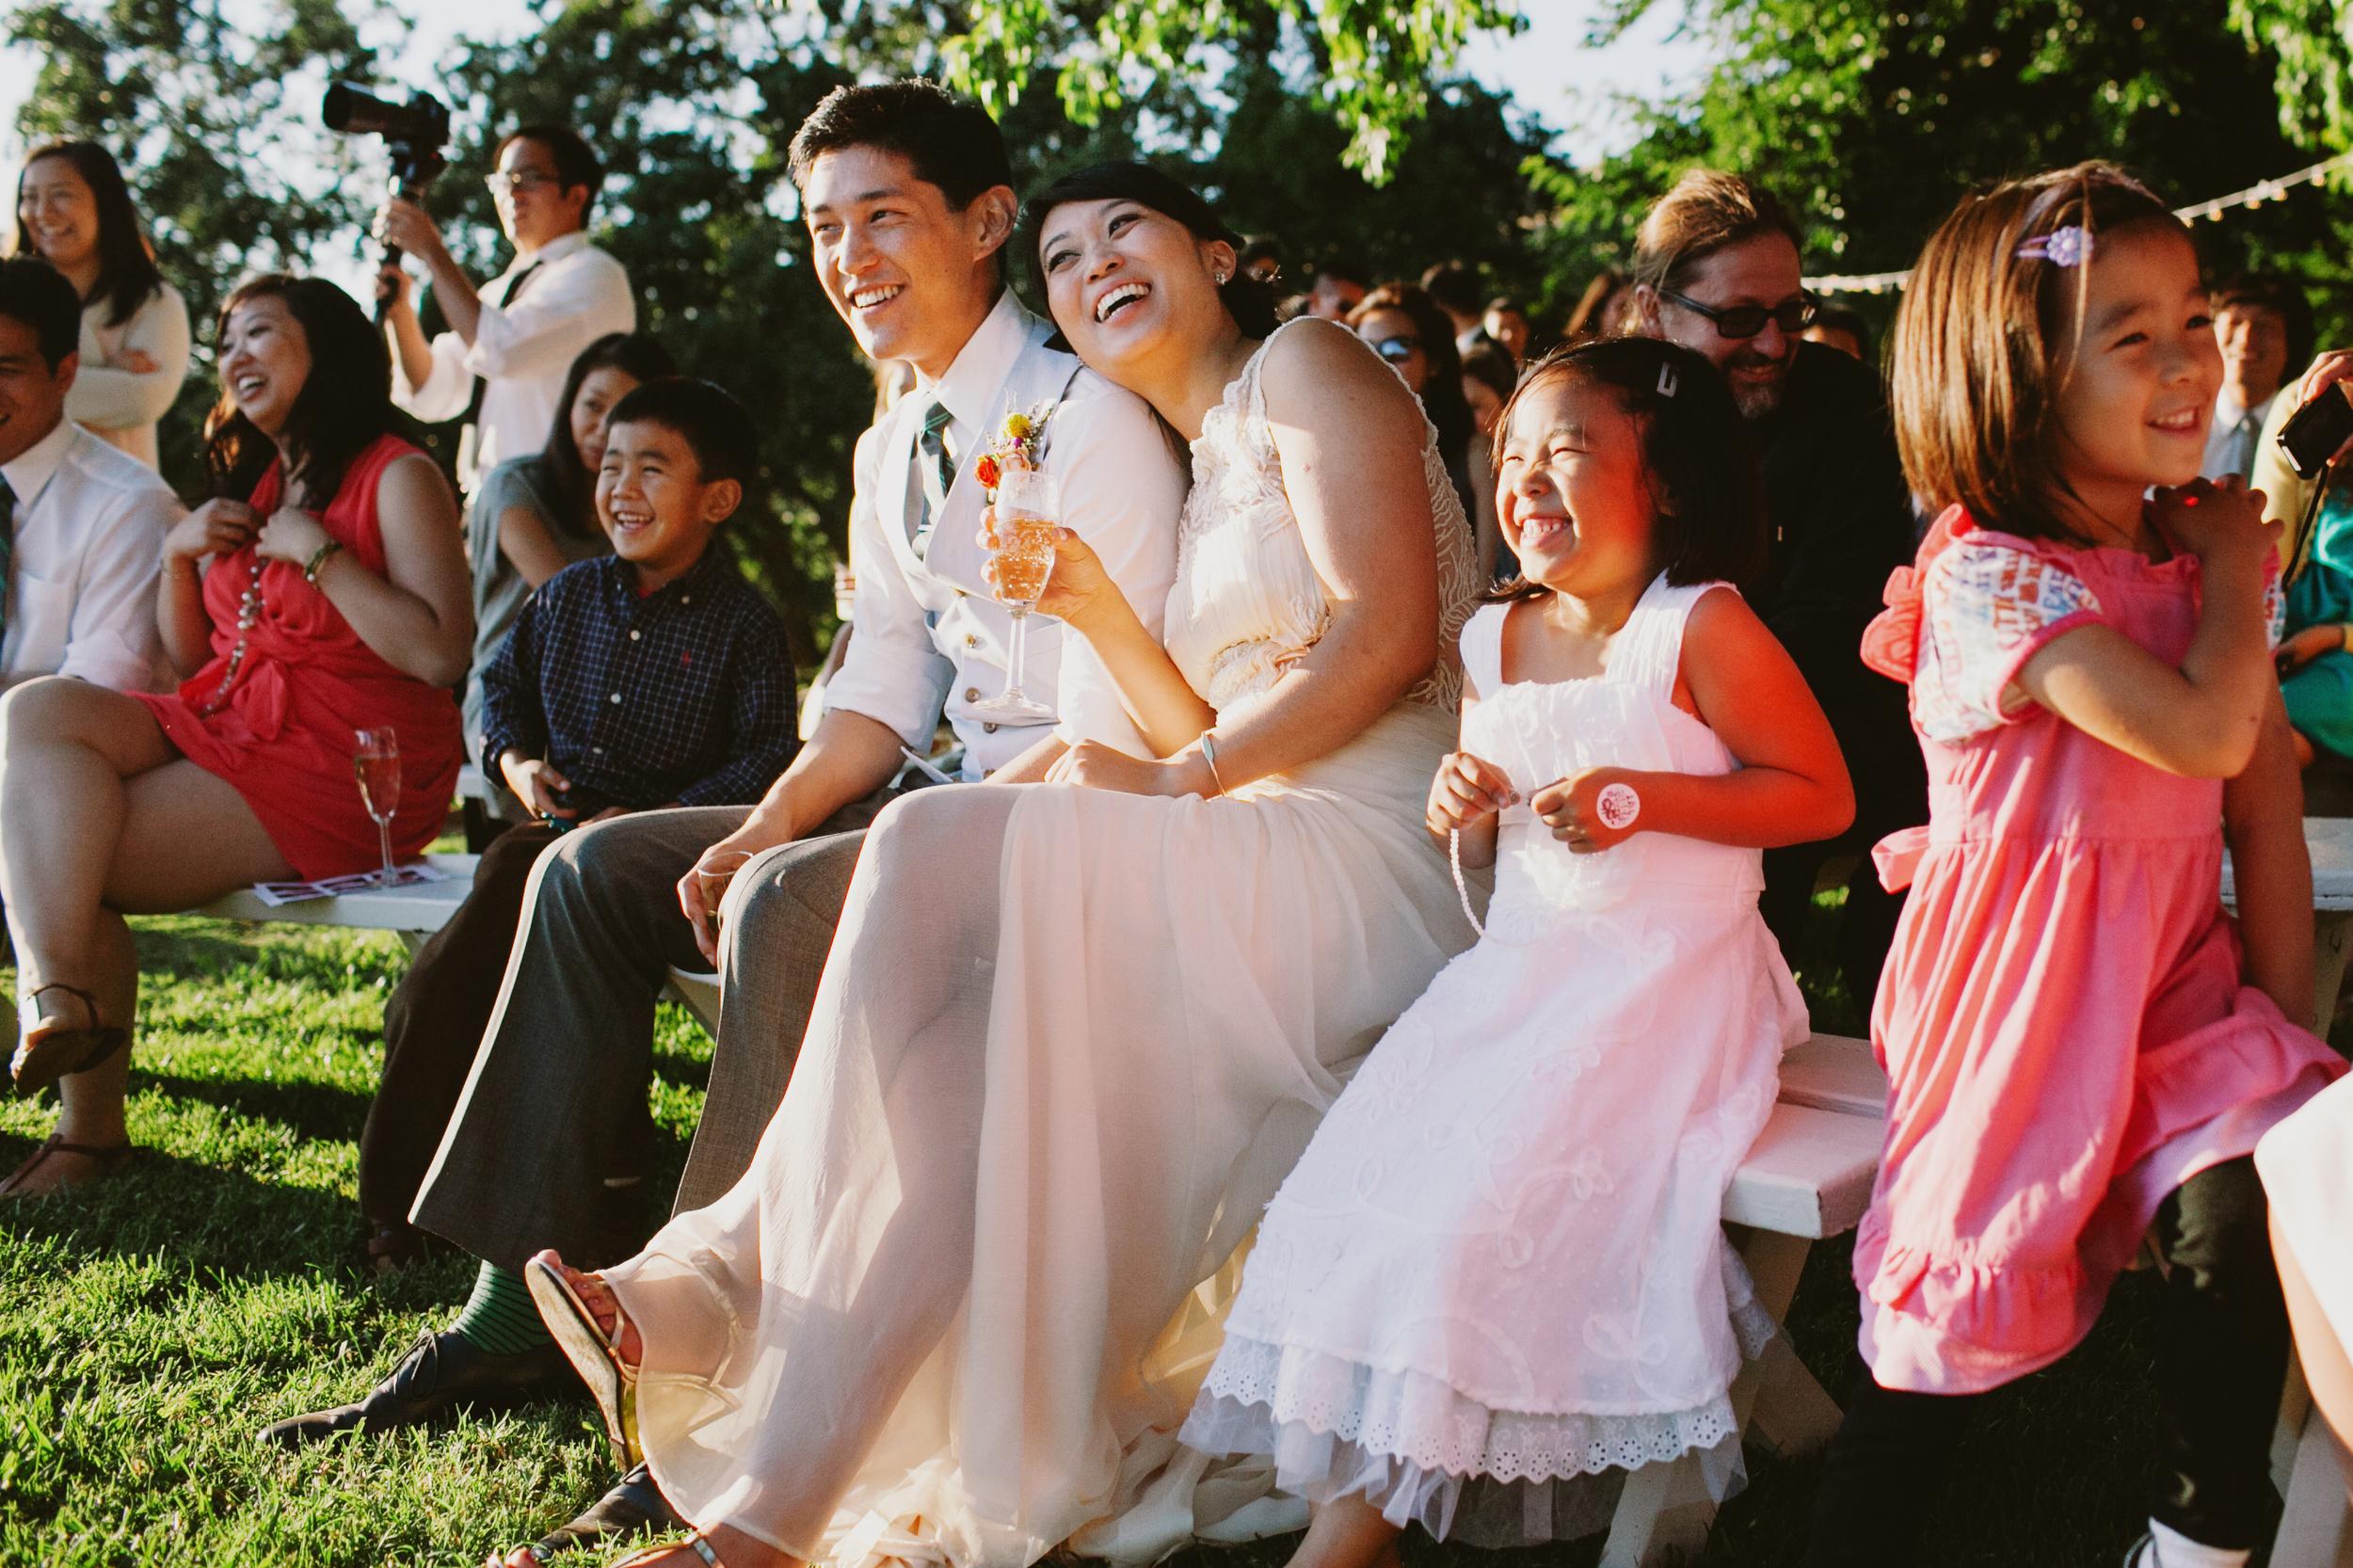 Diablo_Ranch_Wedding_Photography_Becky_Will-31.JPG